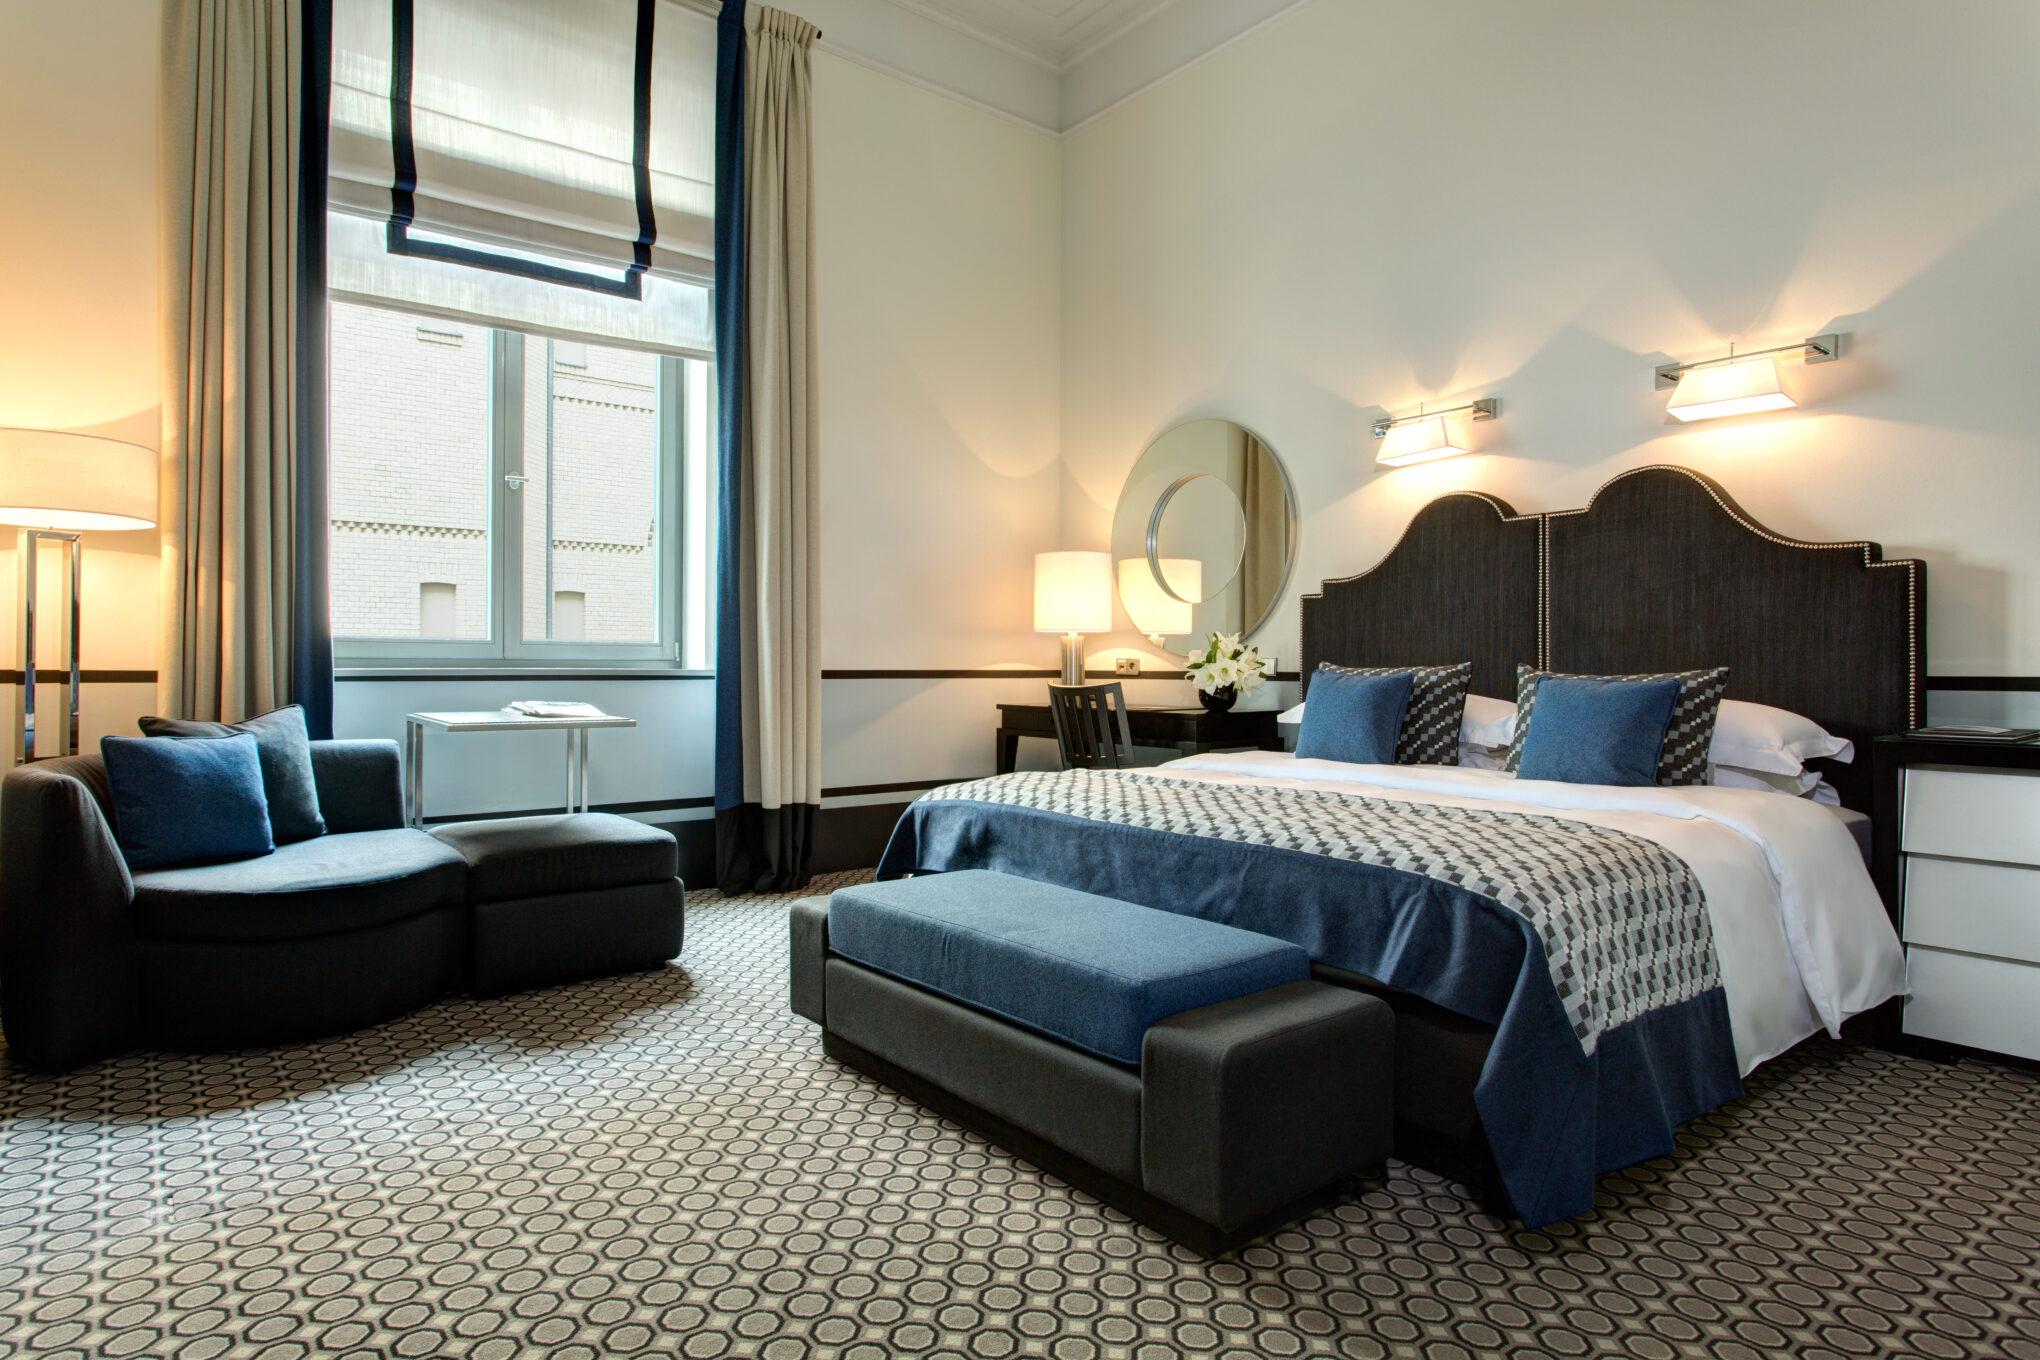 Hotel de Rome Schlafzimmer im Classic Room